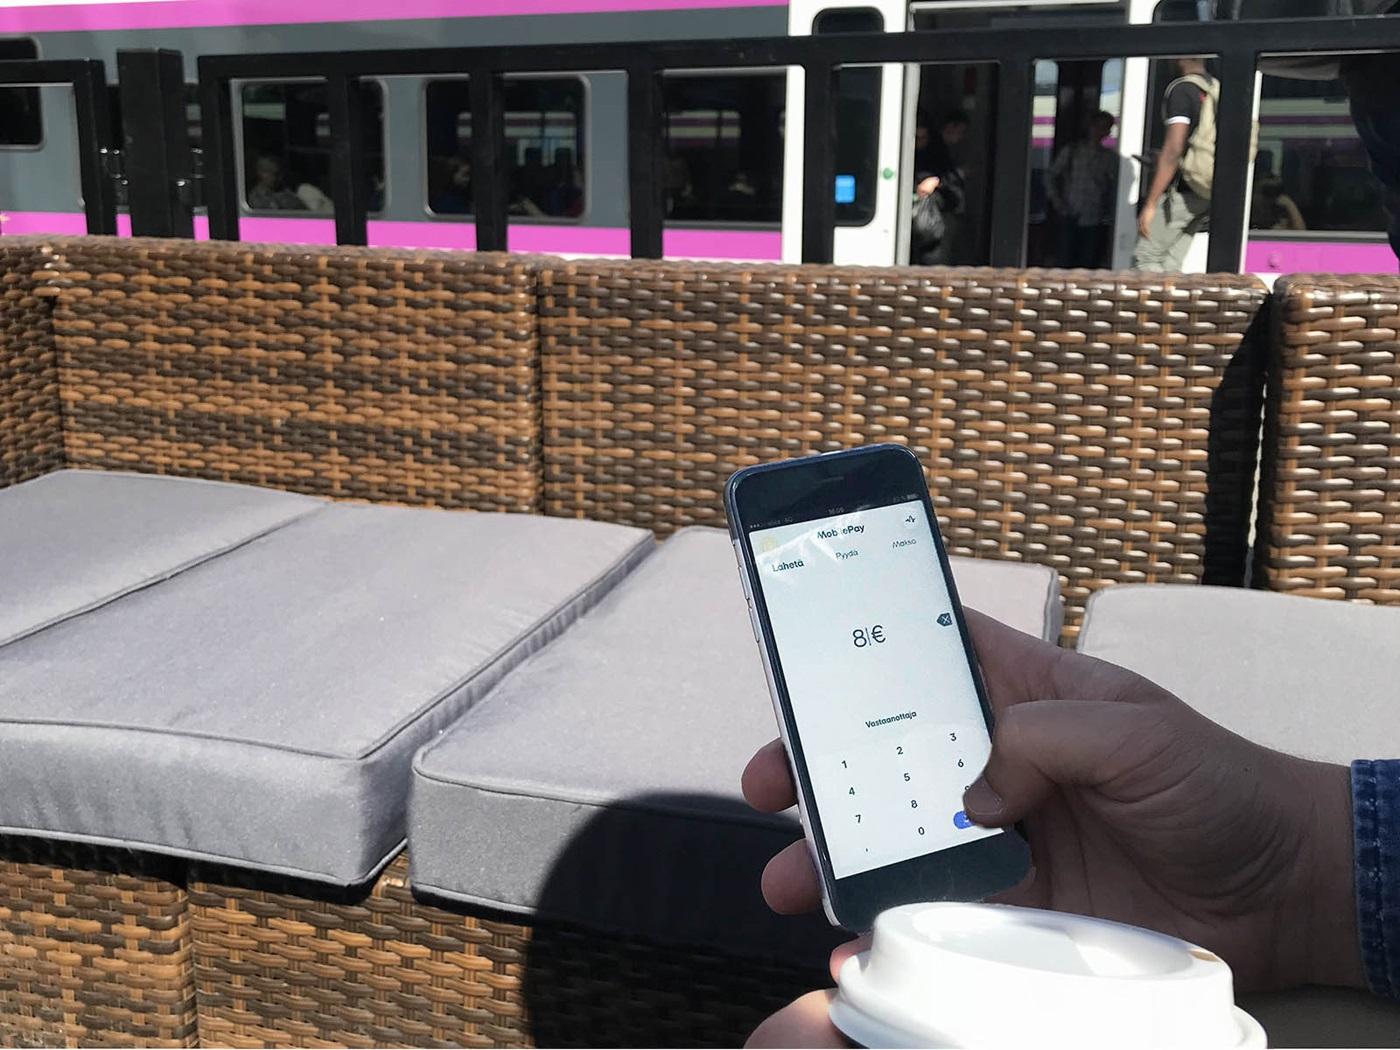 MobilePayn ja VR:n yhteistyö käynnistyy - MobilePay.fi